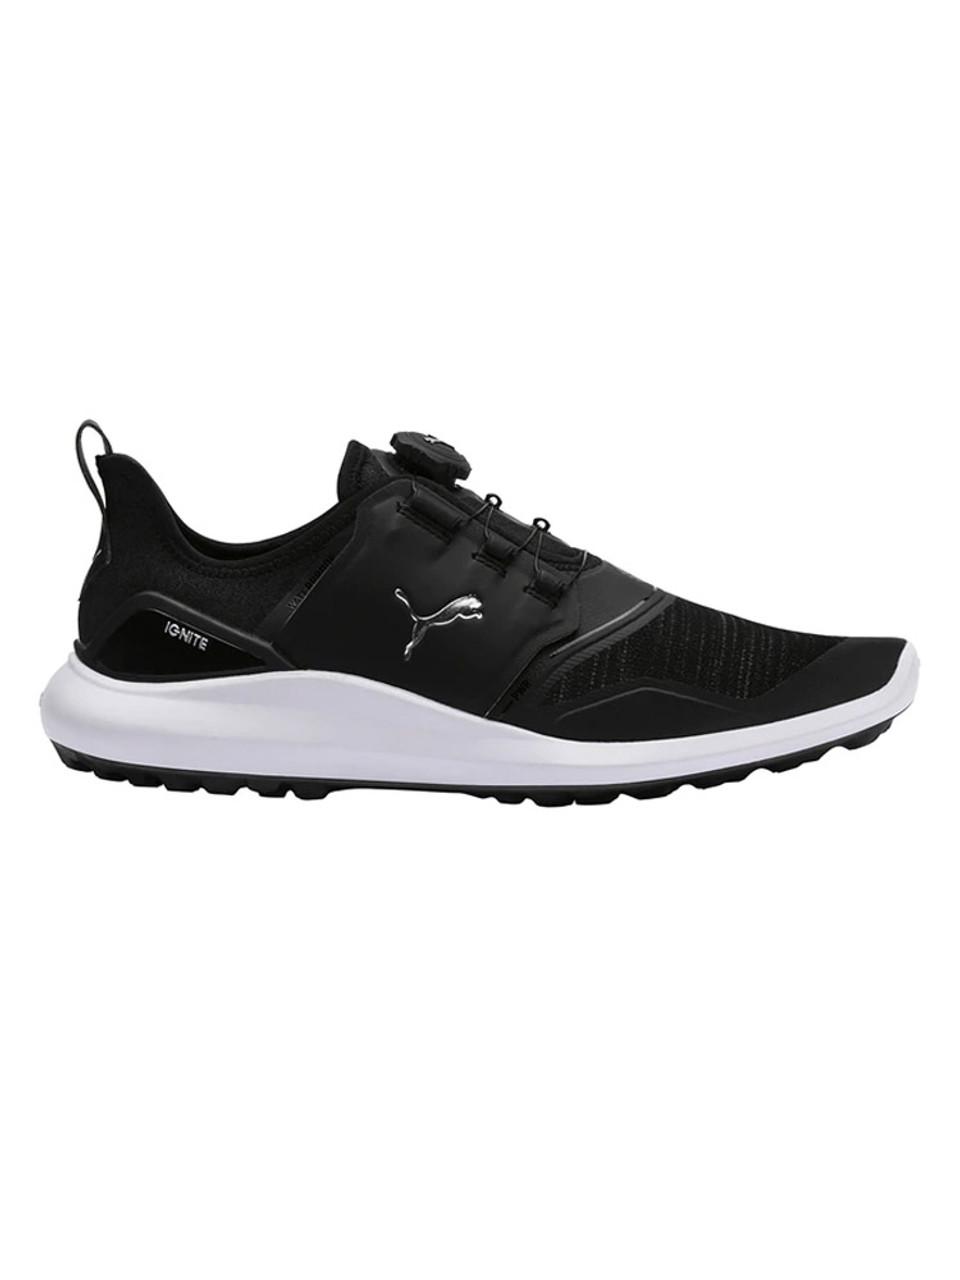 Puma Ignite NXT Disc Golf Shoes Puma BlackSilverWhite